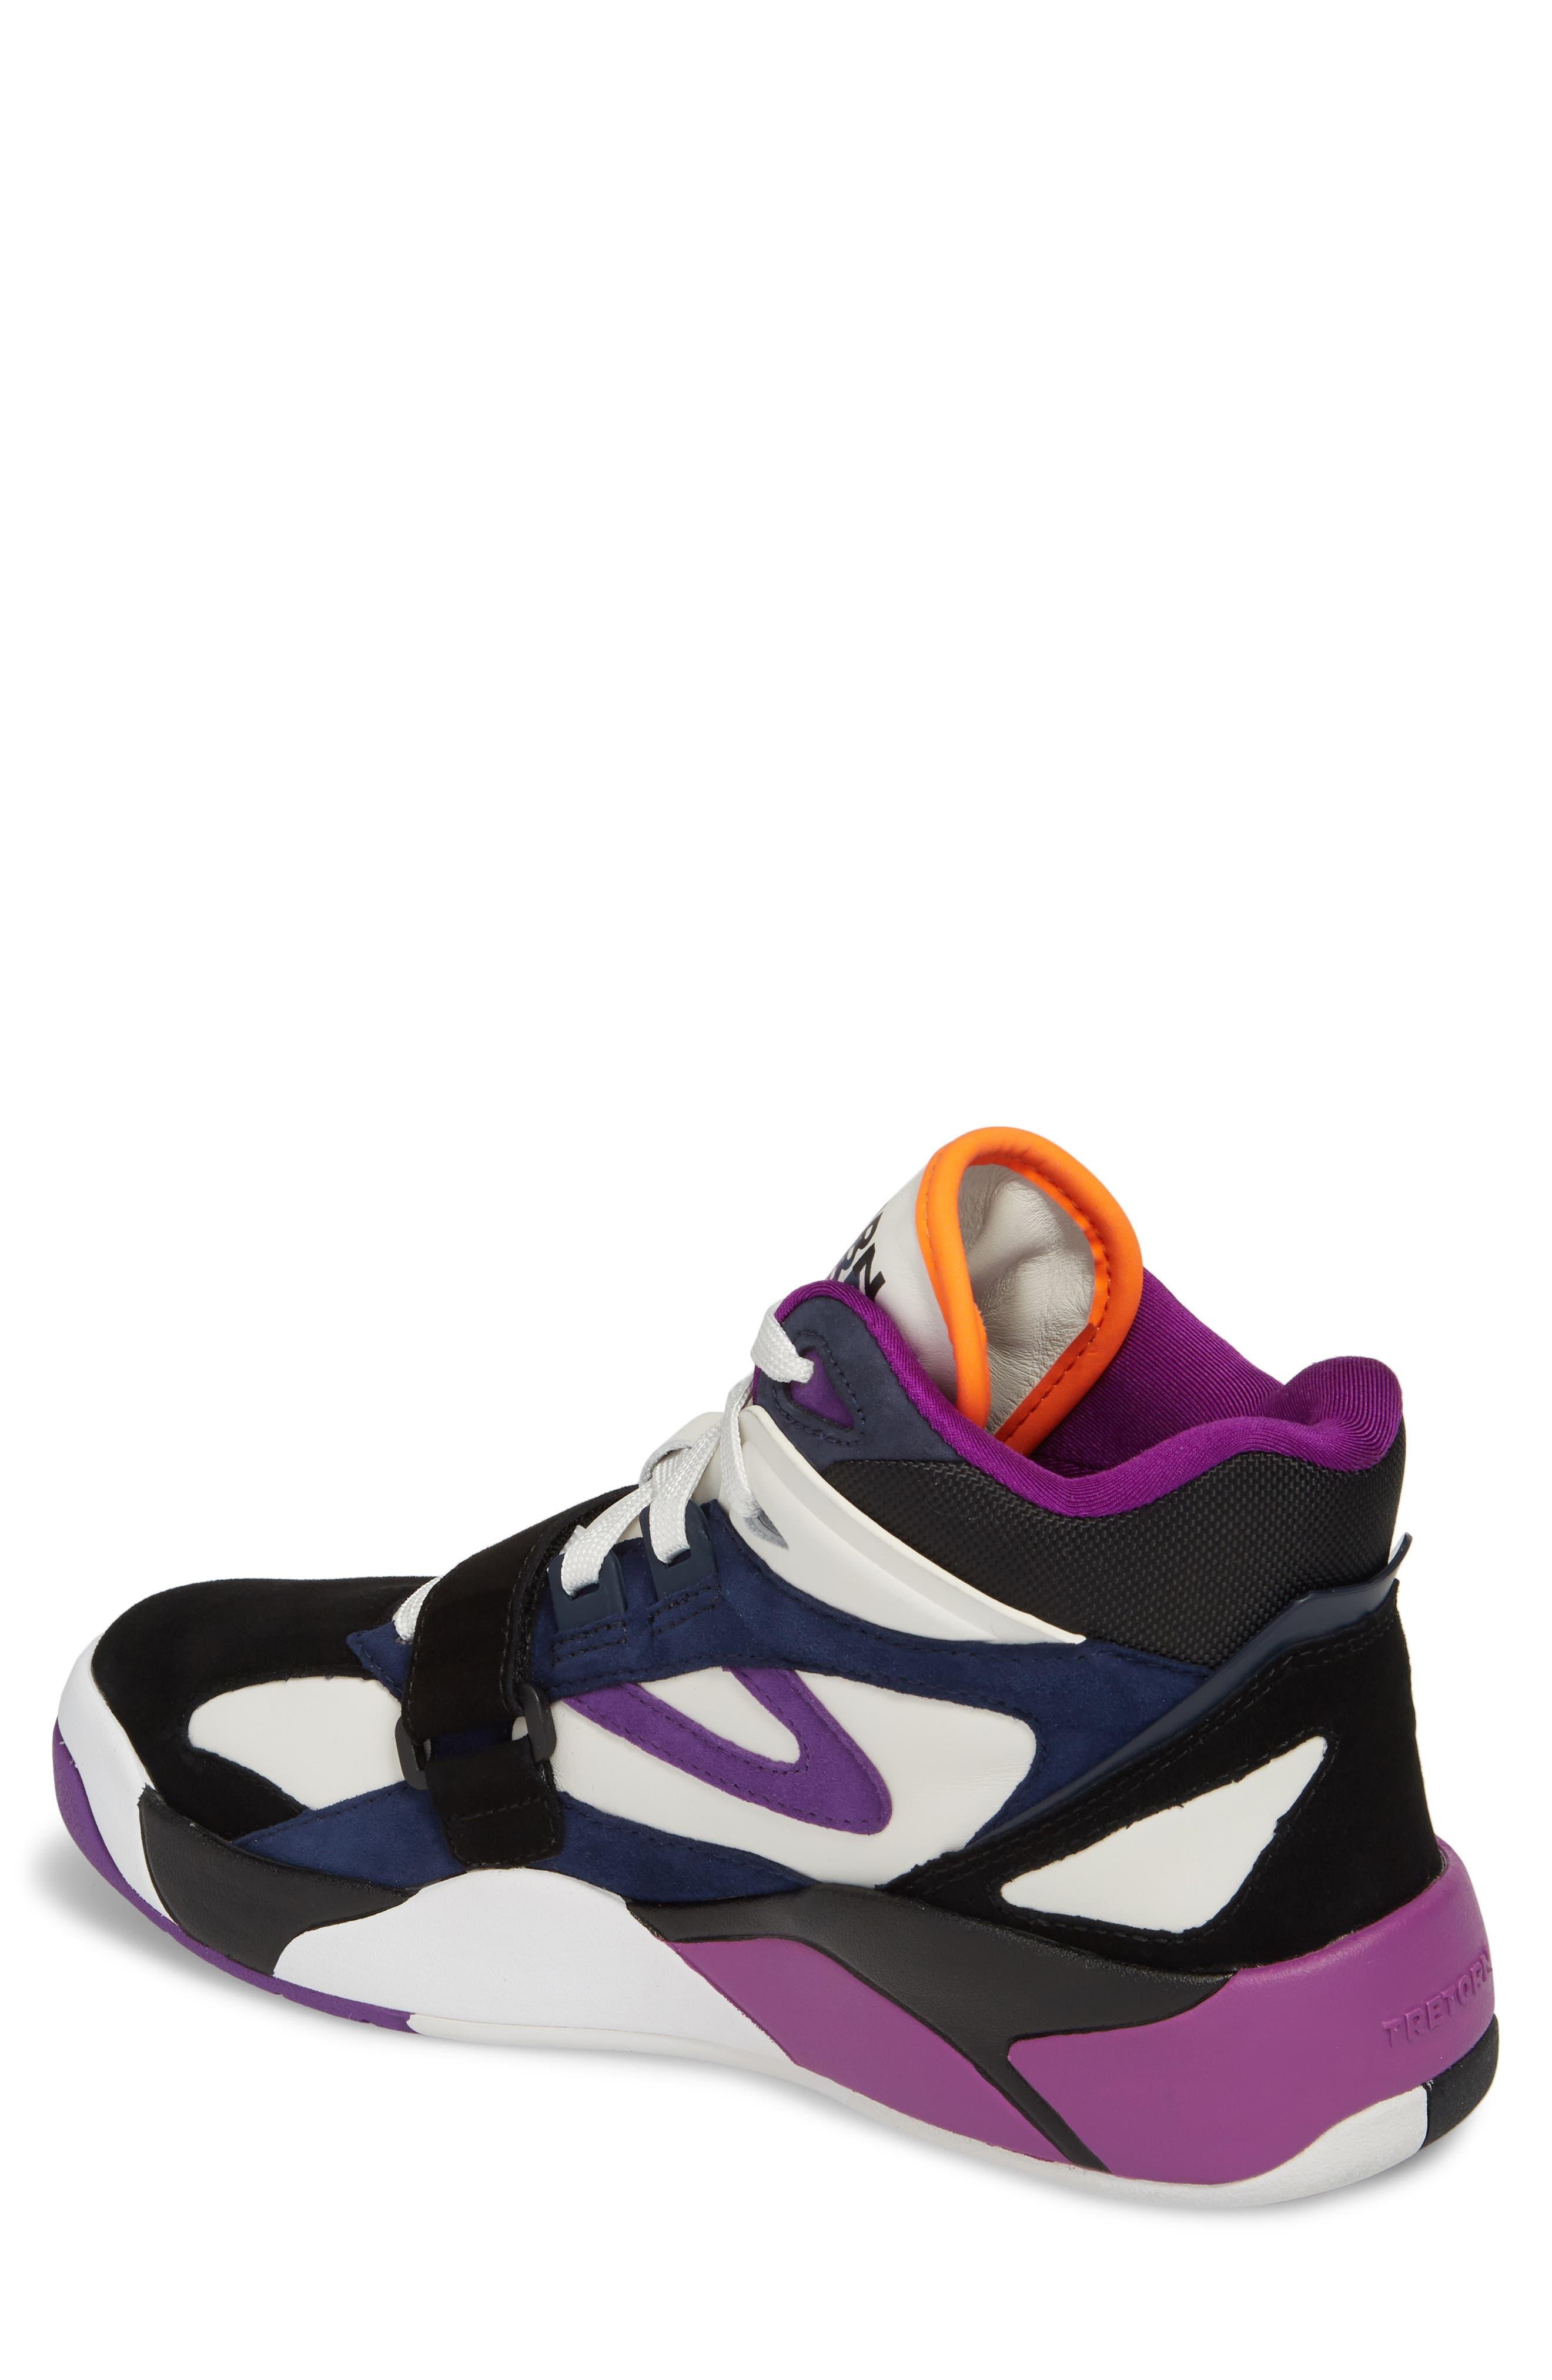 Andre 3000 Bostad 2 High Top Sneaker,                             Alternate thumbnail 2, color,                             Black/ White/ Purple